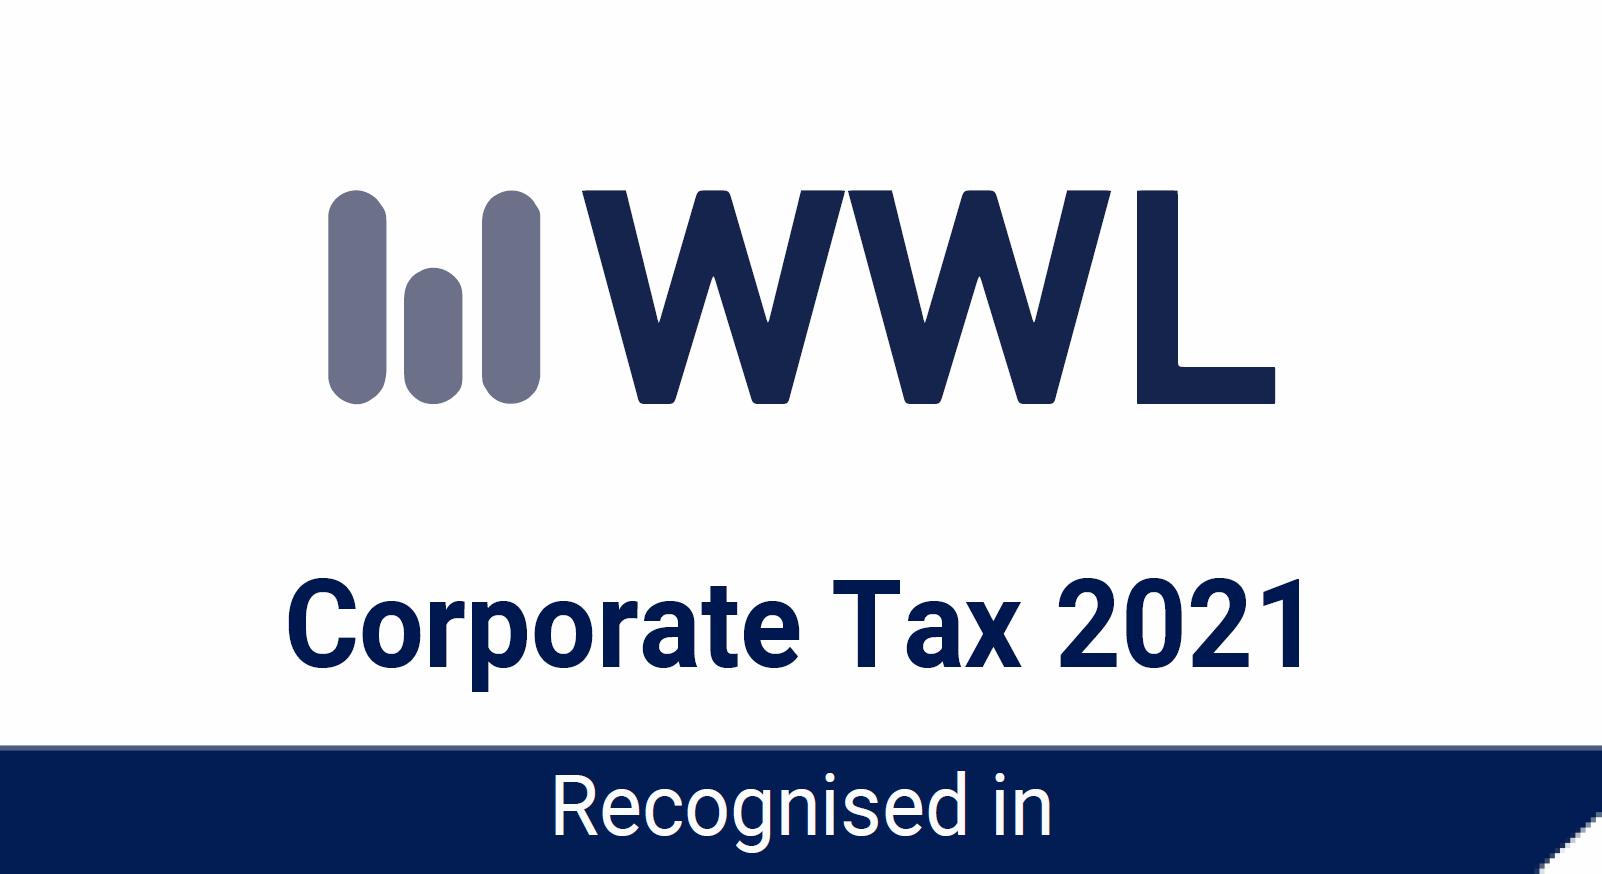 WWL Corporate Tax 2021 Rosette - Awards